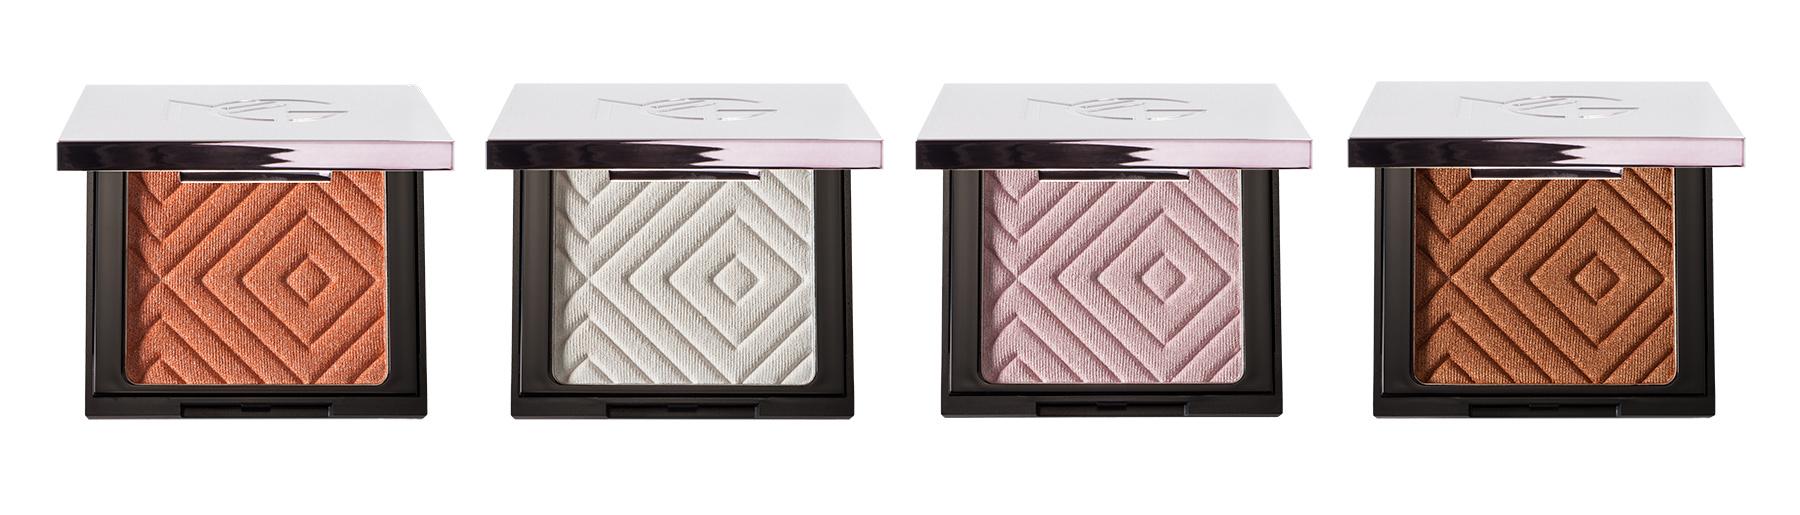 Makeup-Geek-square-compact-comp.jpg